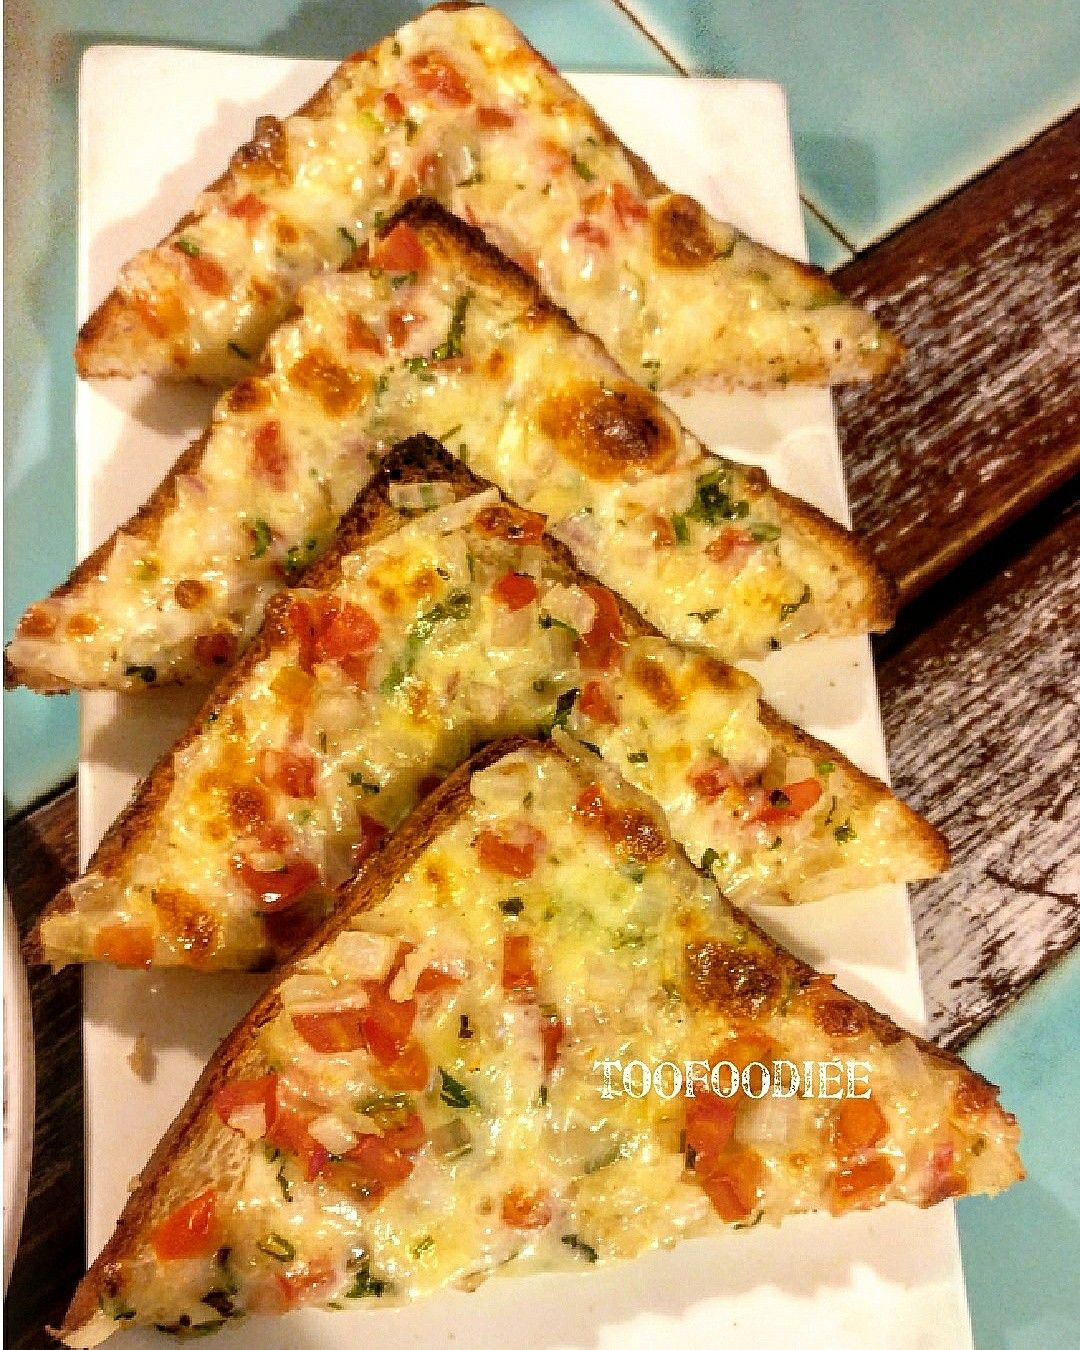 Chilli garlic toast on board!!! #rosecafedelhi